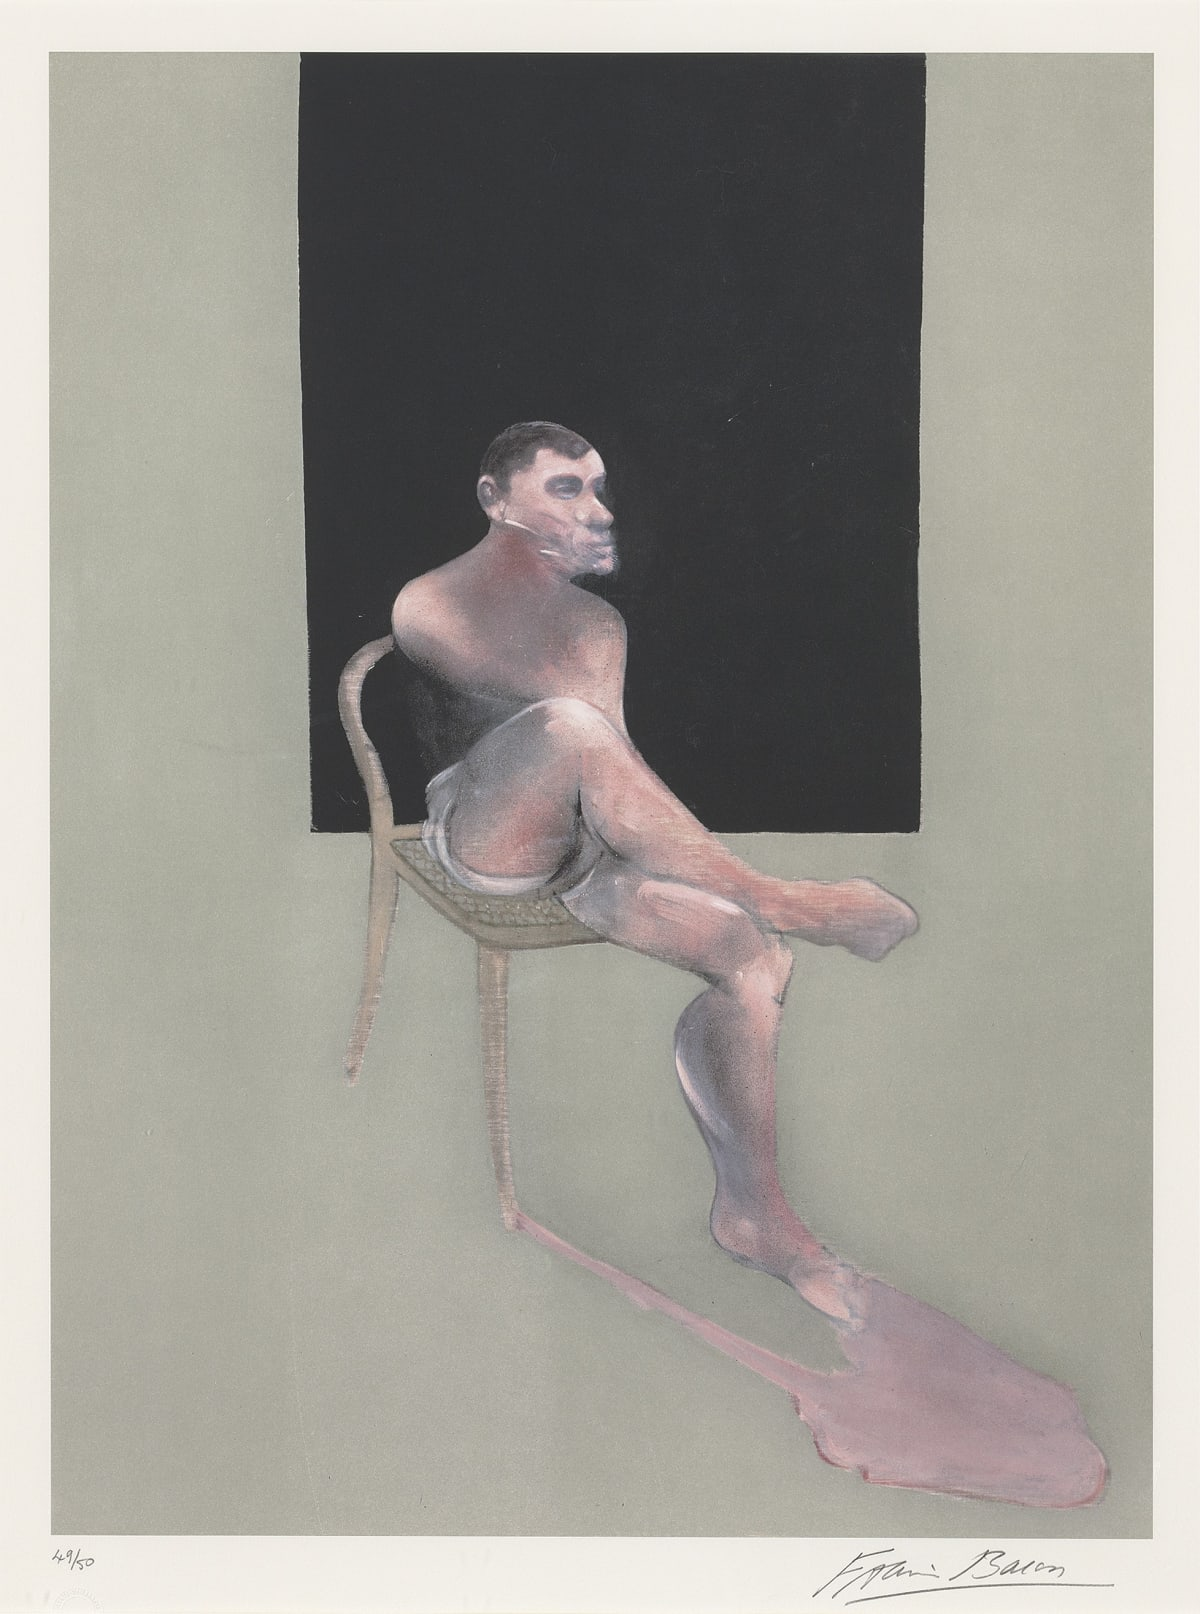 Francis Bacon, Portrait of John Edwards, 2002